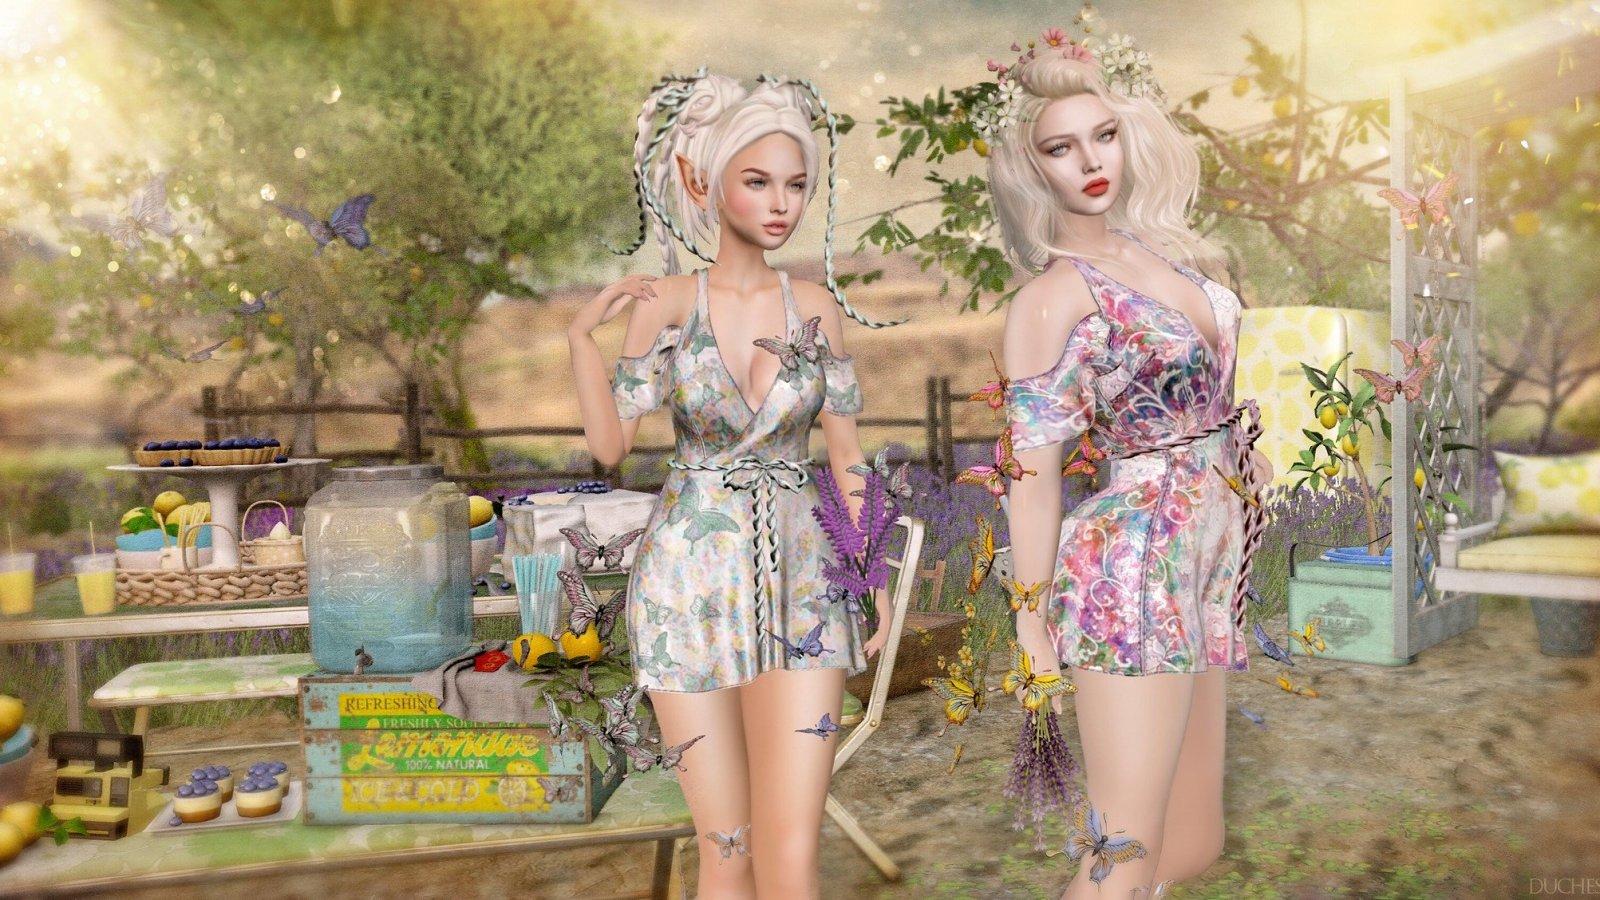 Lavender and Lemonade